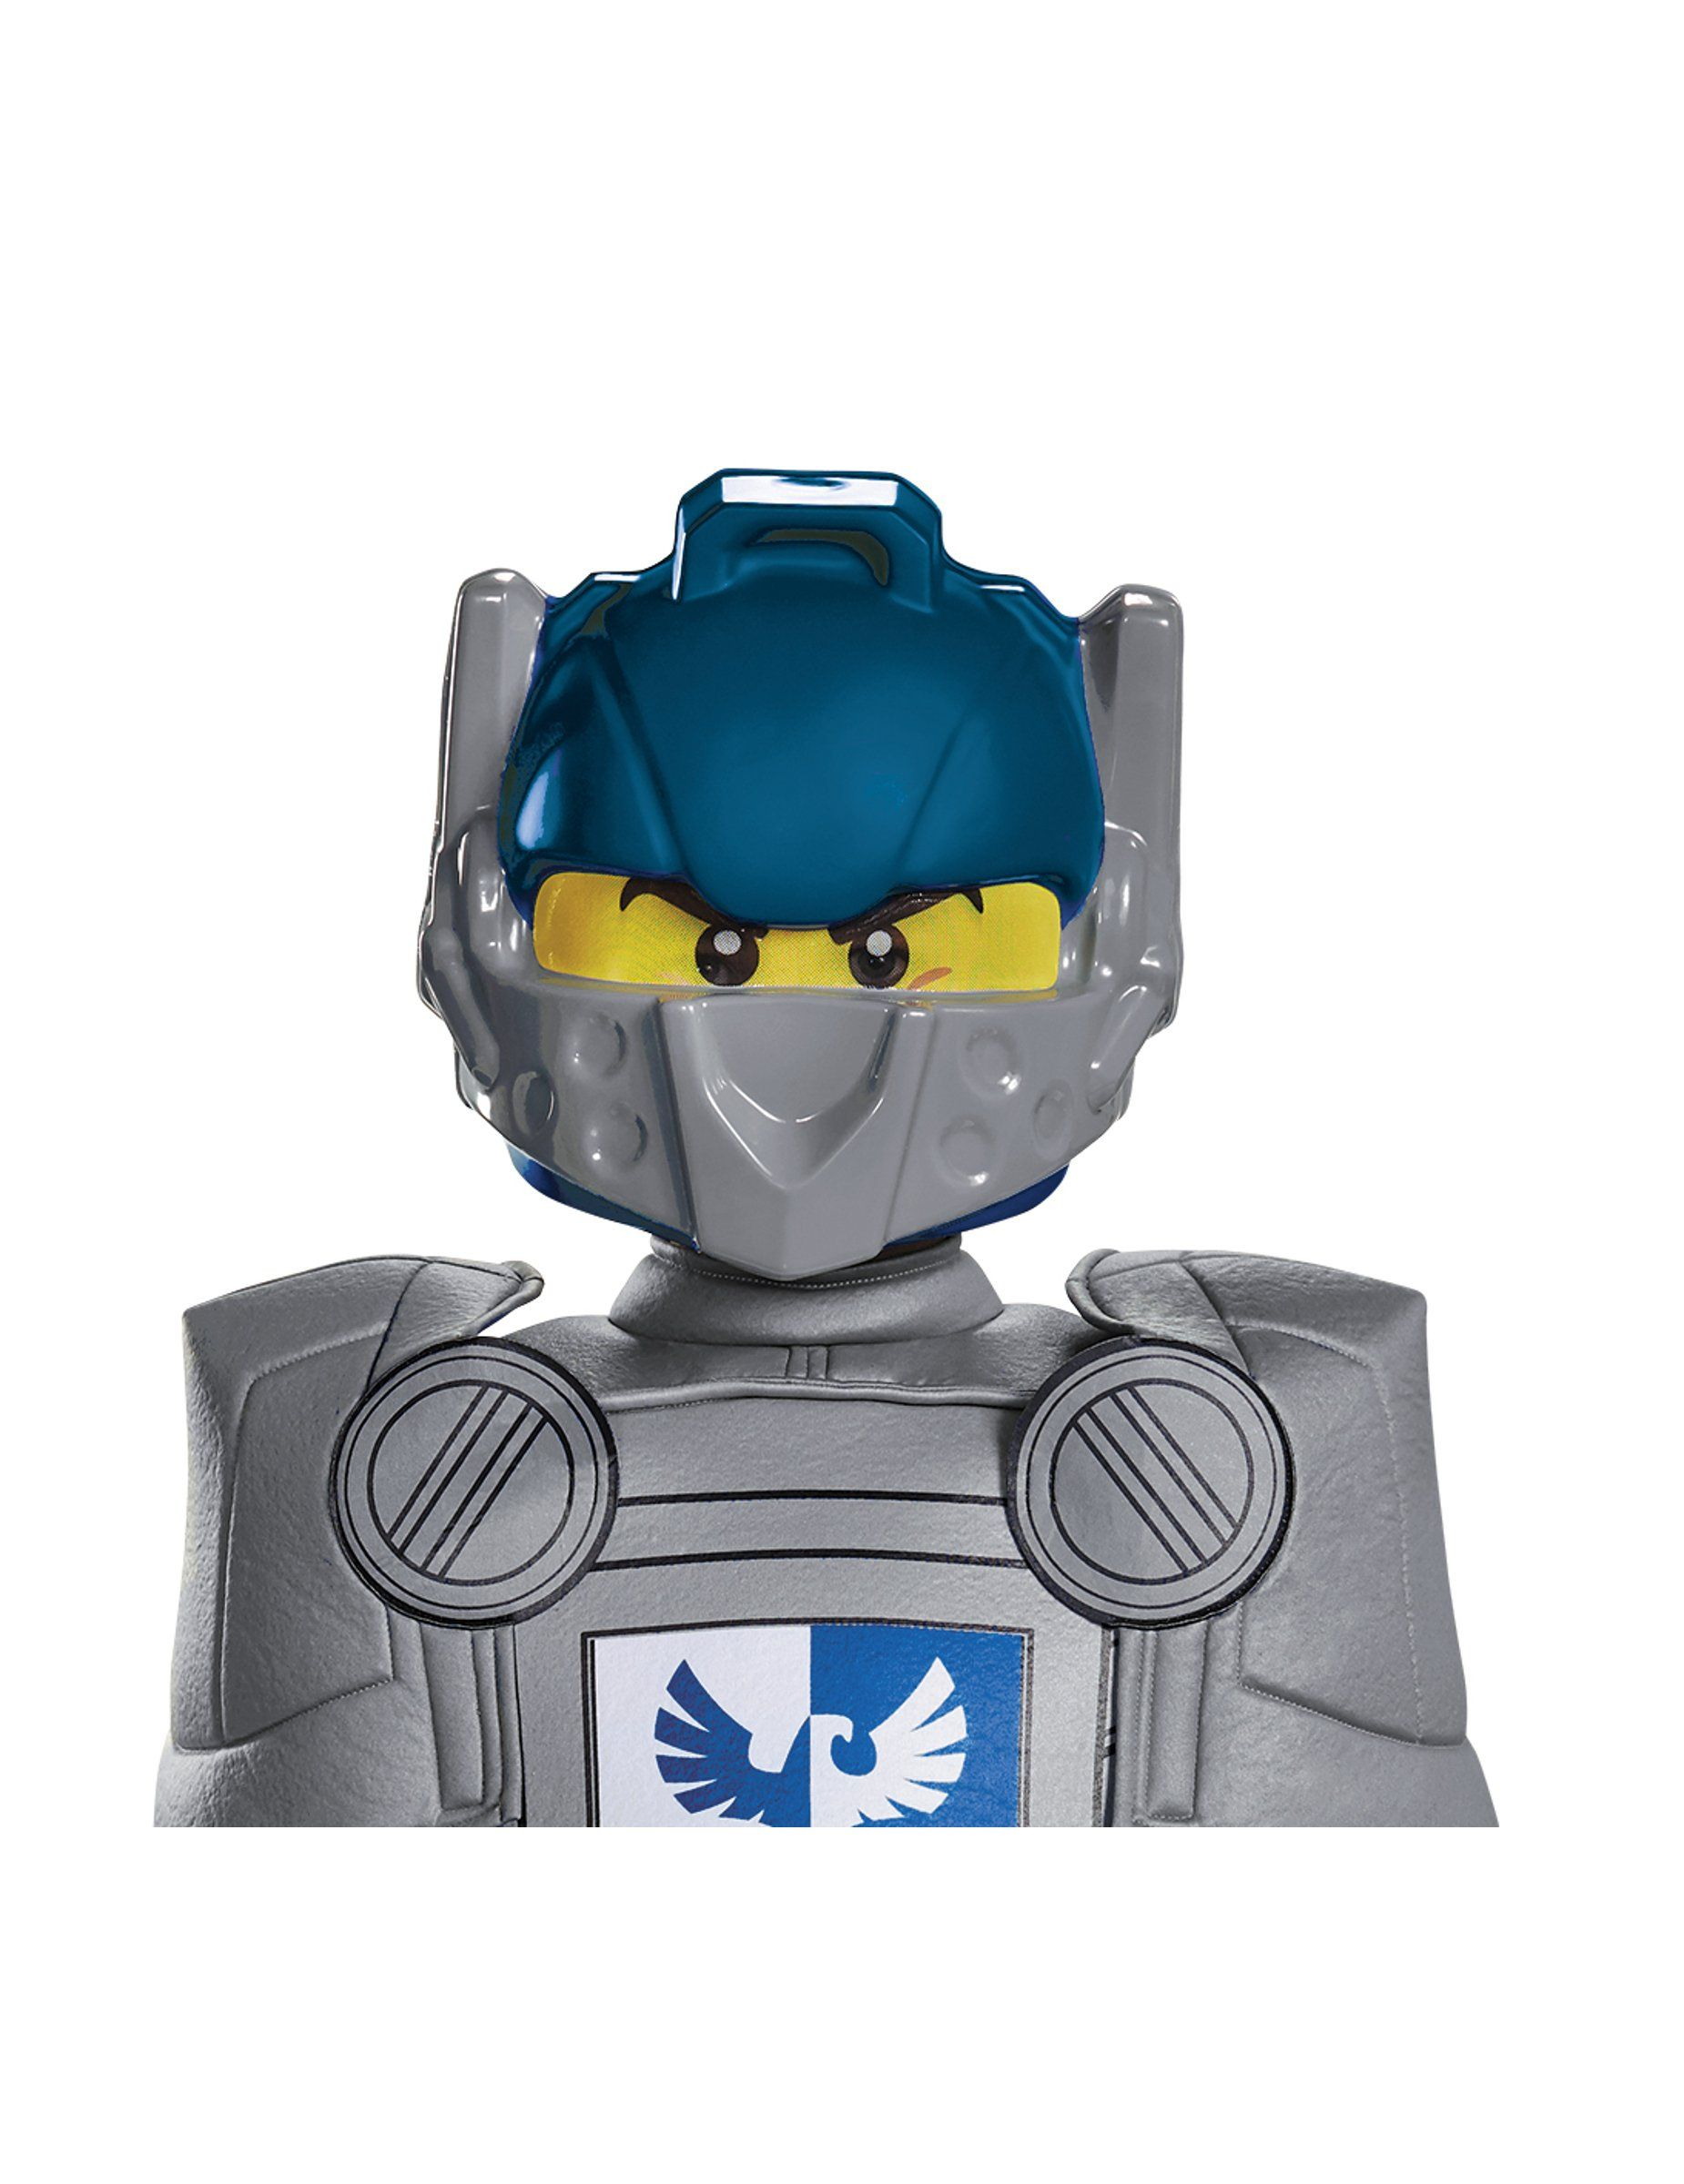 Masque Clay Nexo Knights™ - LEGO® enfant #CadeauDeNoel #ListeDuPereNoel #TopCadeau #Noel2016 #Lego #NinjaGo #NexoKnights